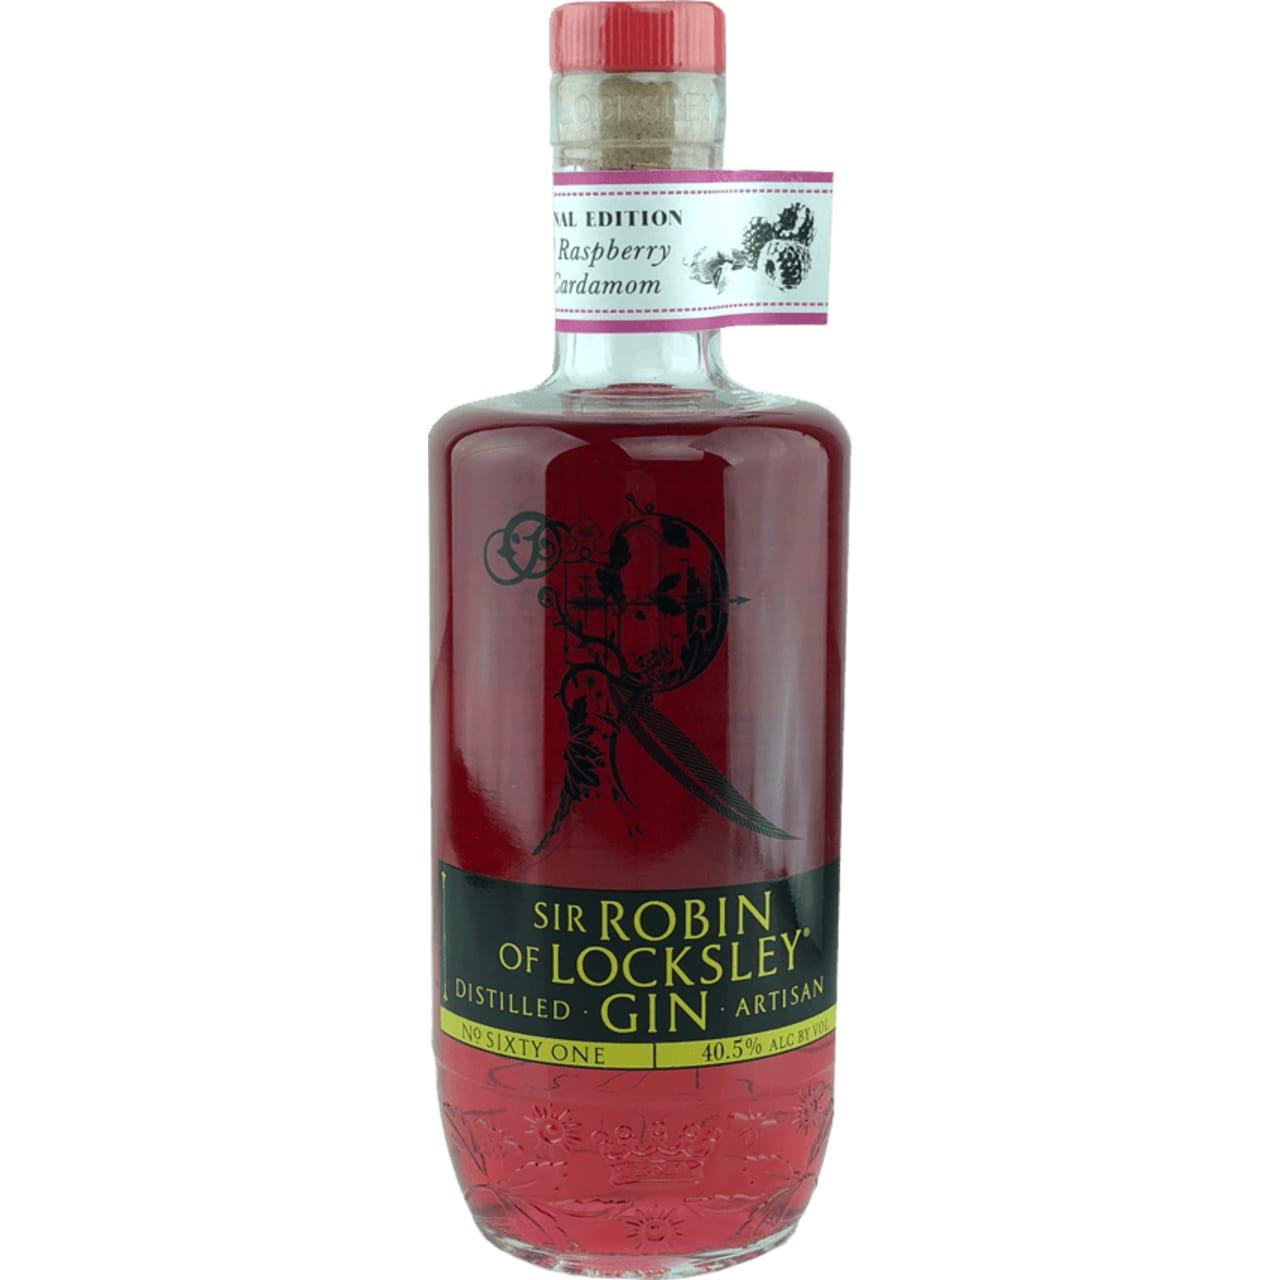 Product Image - Sir Robin of Locksley Real Raspberry & Cardamom Gin